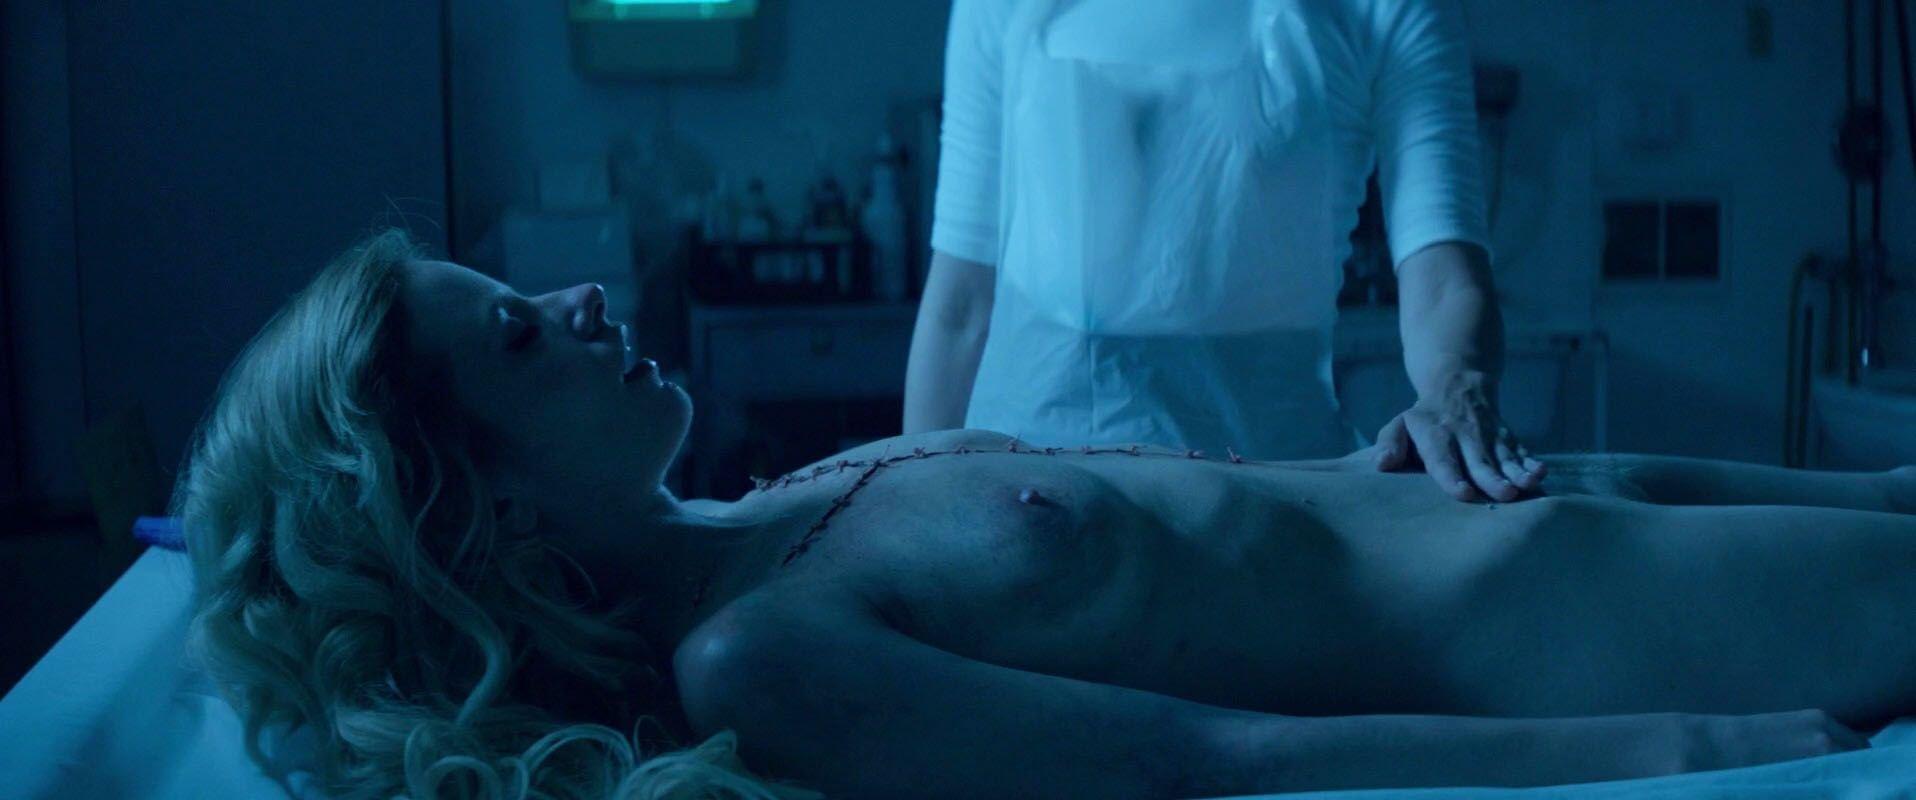 Malone  nackt Jena Elle Fanning